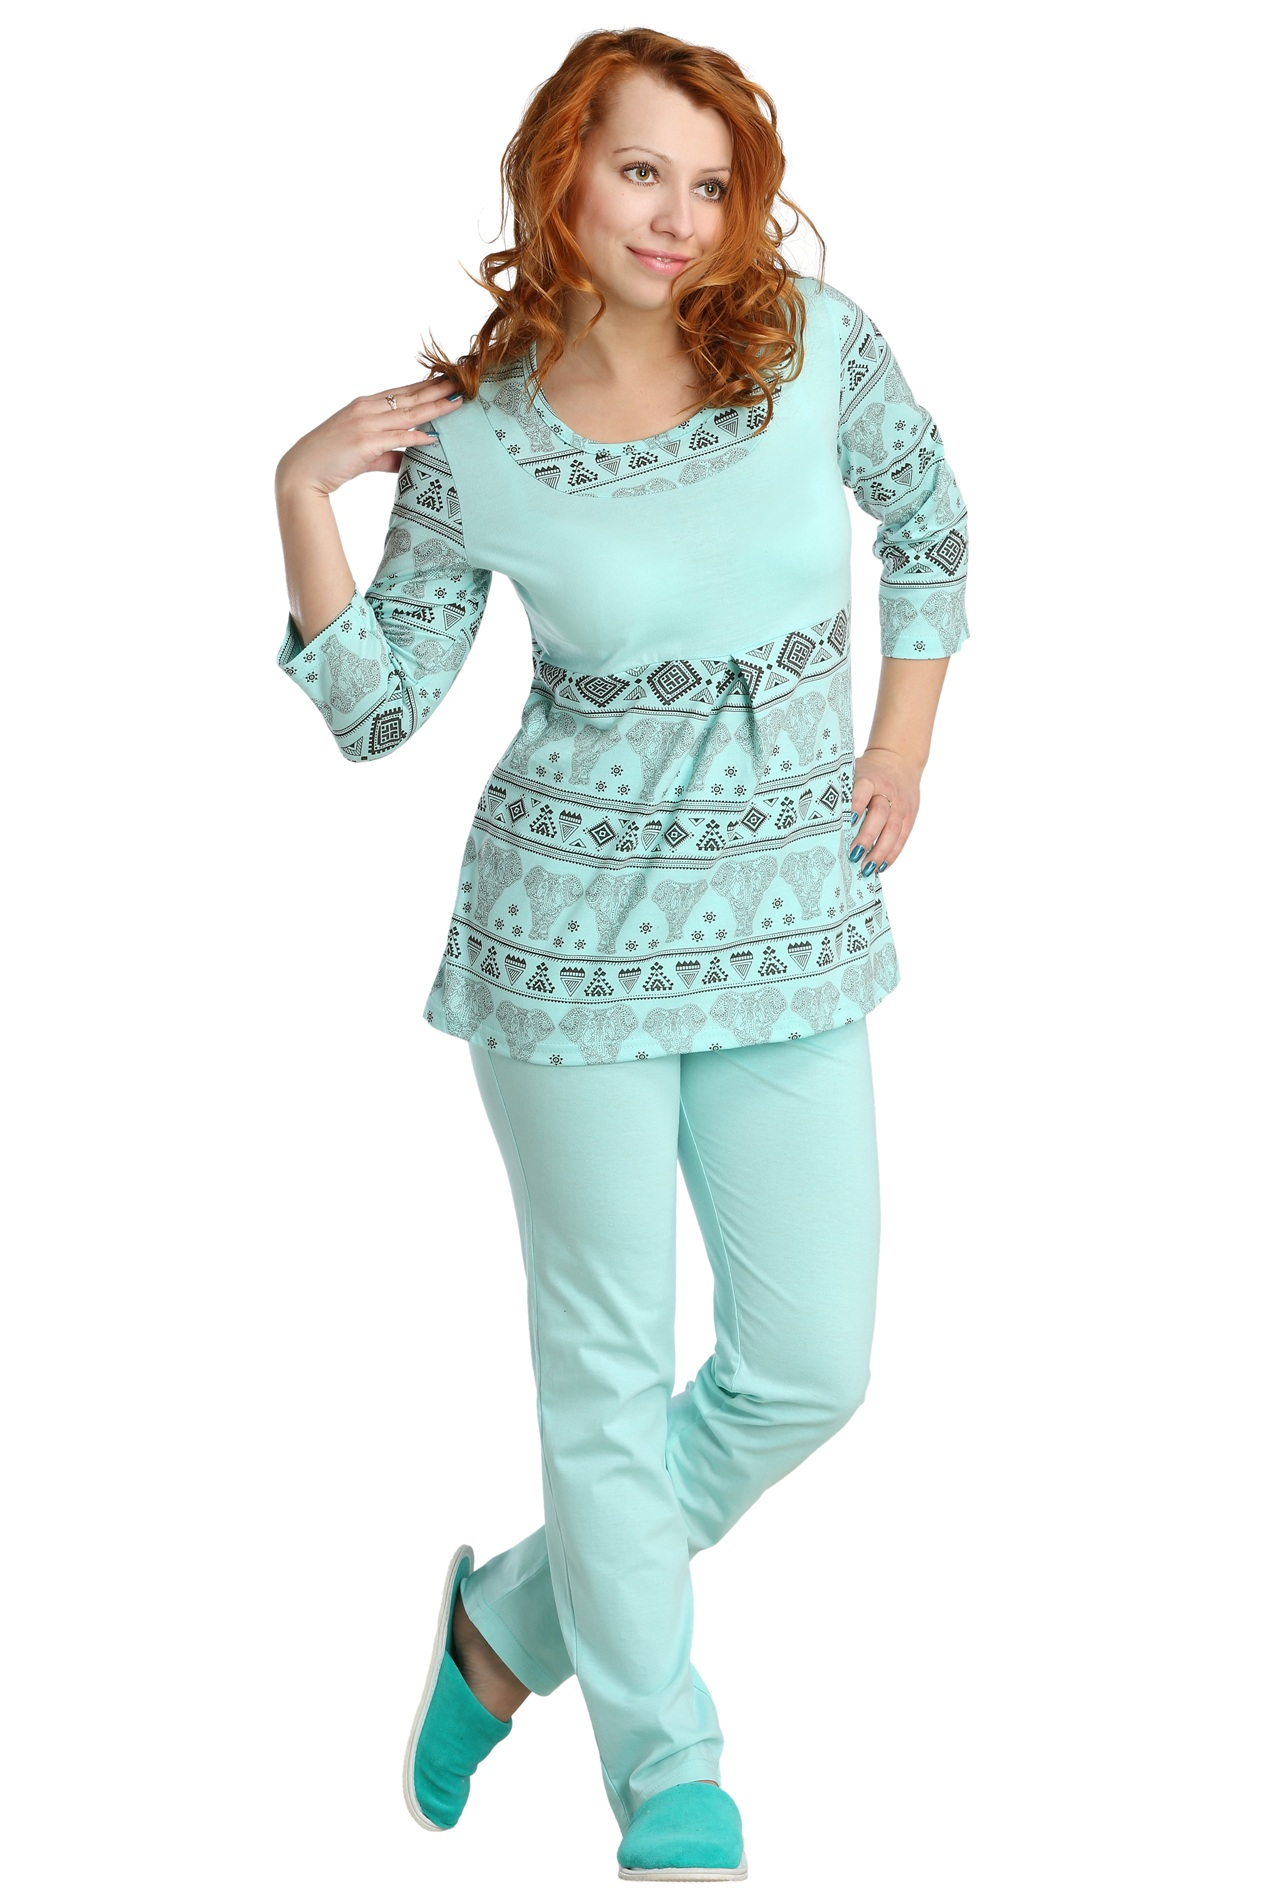 Жен. пижама арт. 16-0087 Ментол р. 44 пижама жен mia cara майка шорты botanical aw15 ubl lst 264 р 42 44 1119503